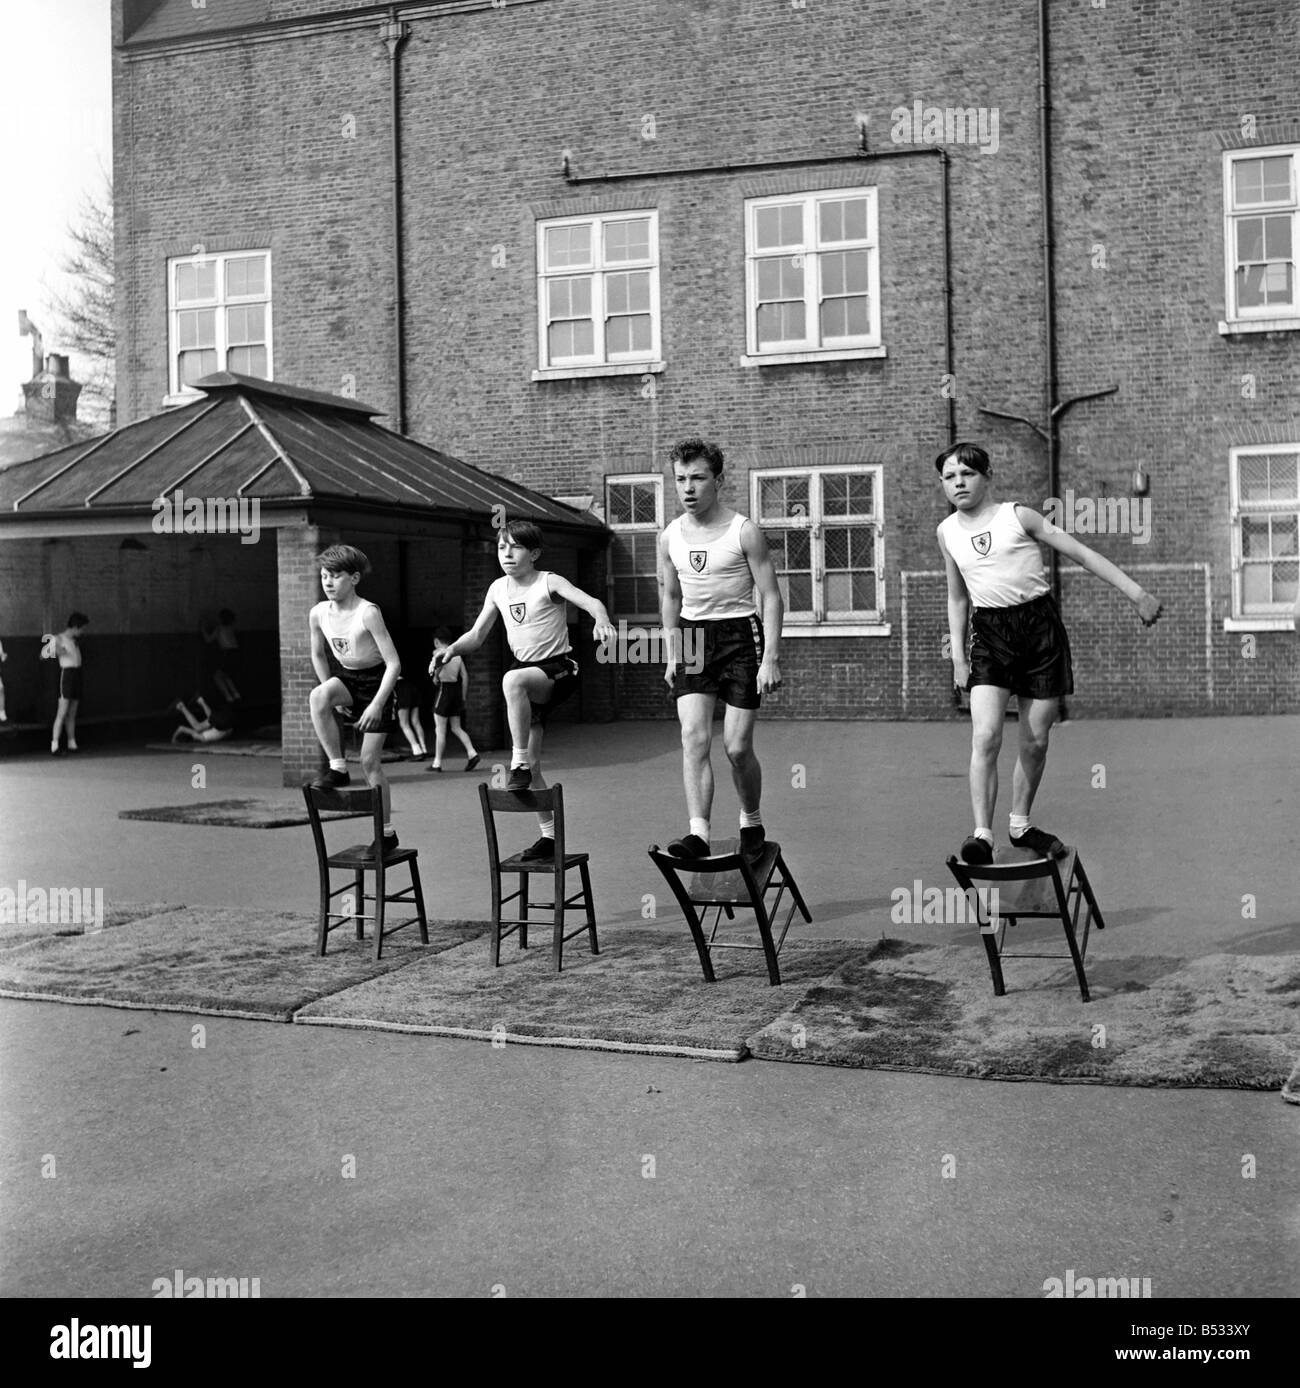 William Blake Secondary School, Battersea. Gymnastics. March 1952 C1257-004 - Stock Image